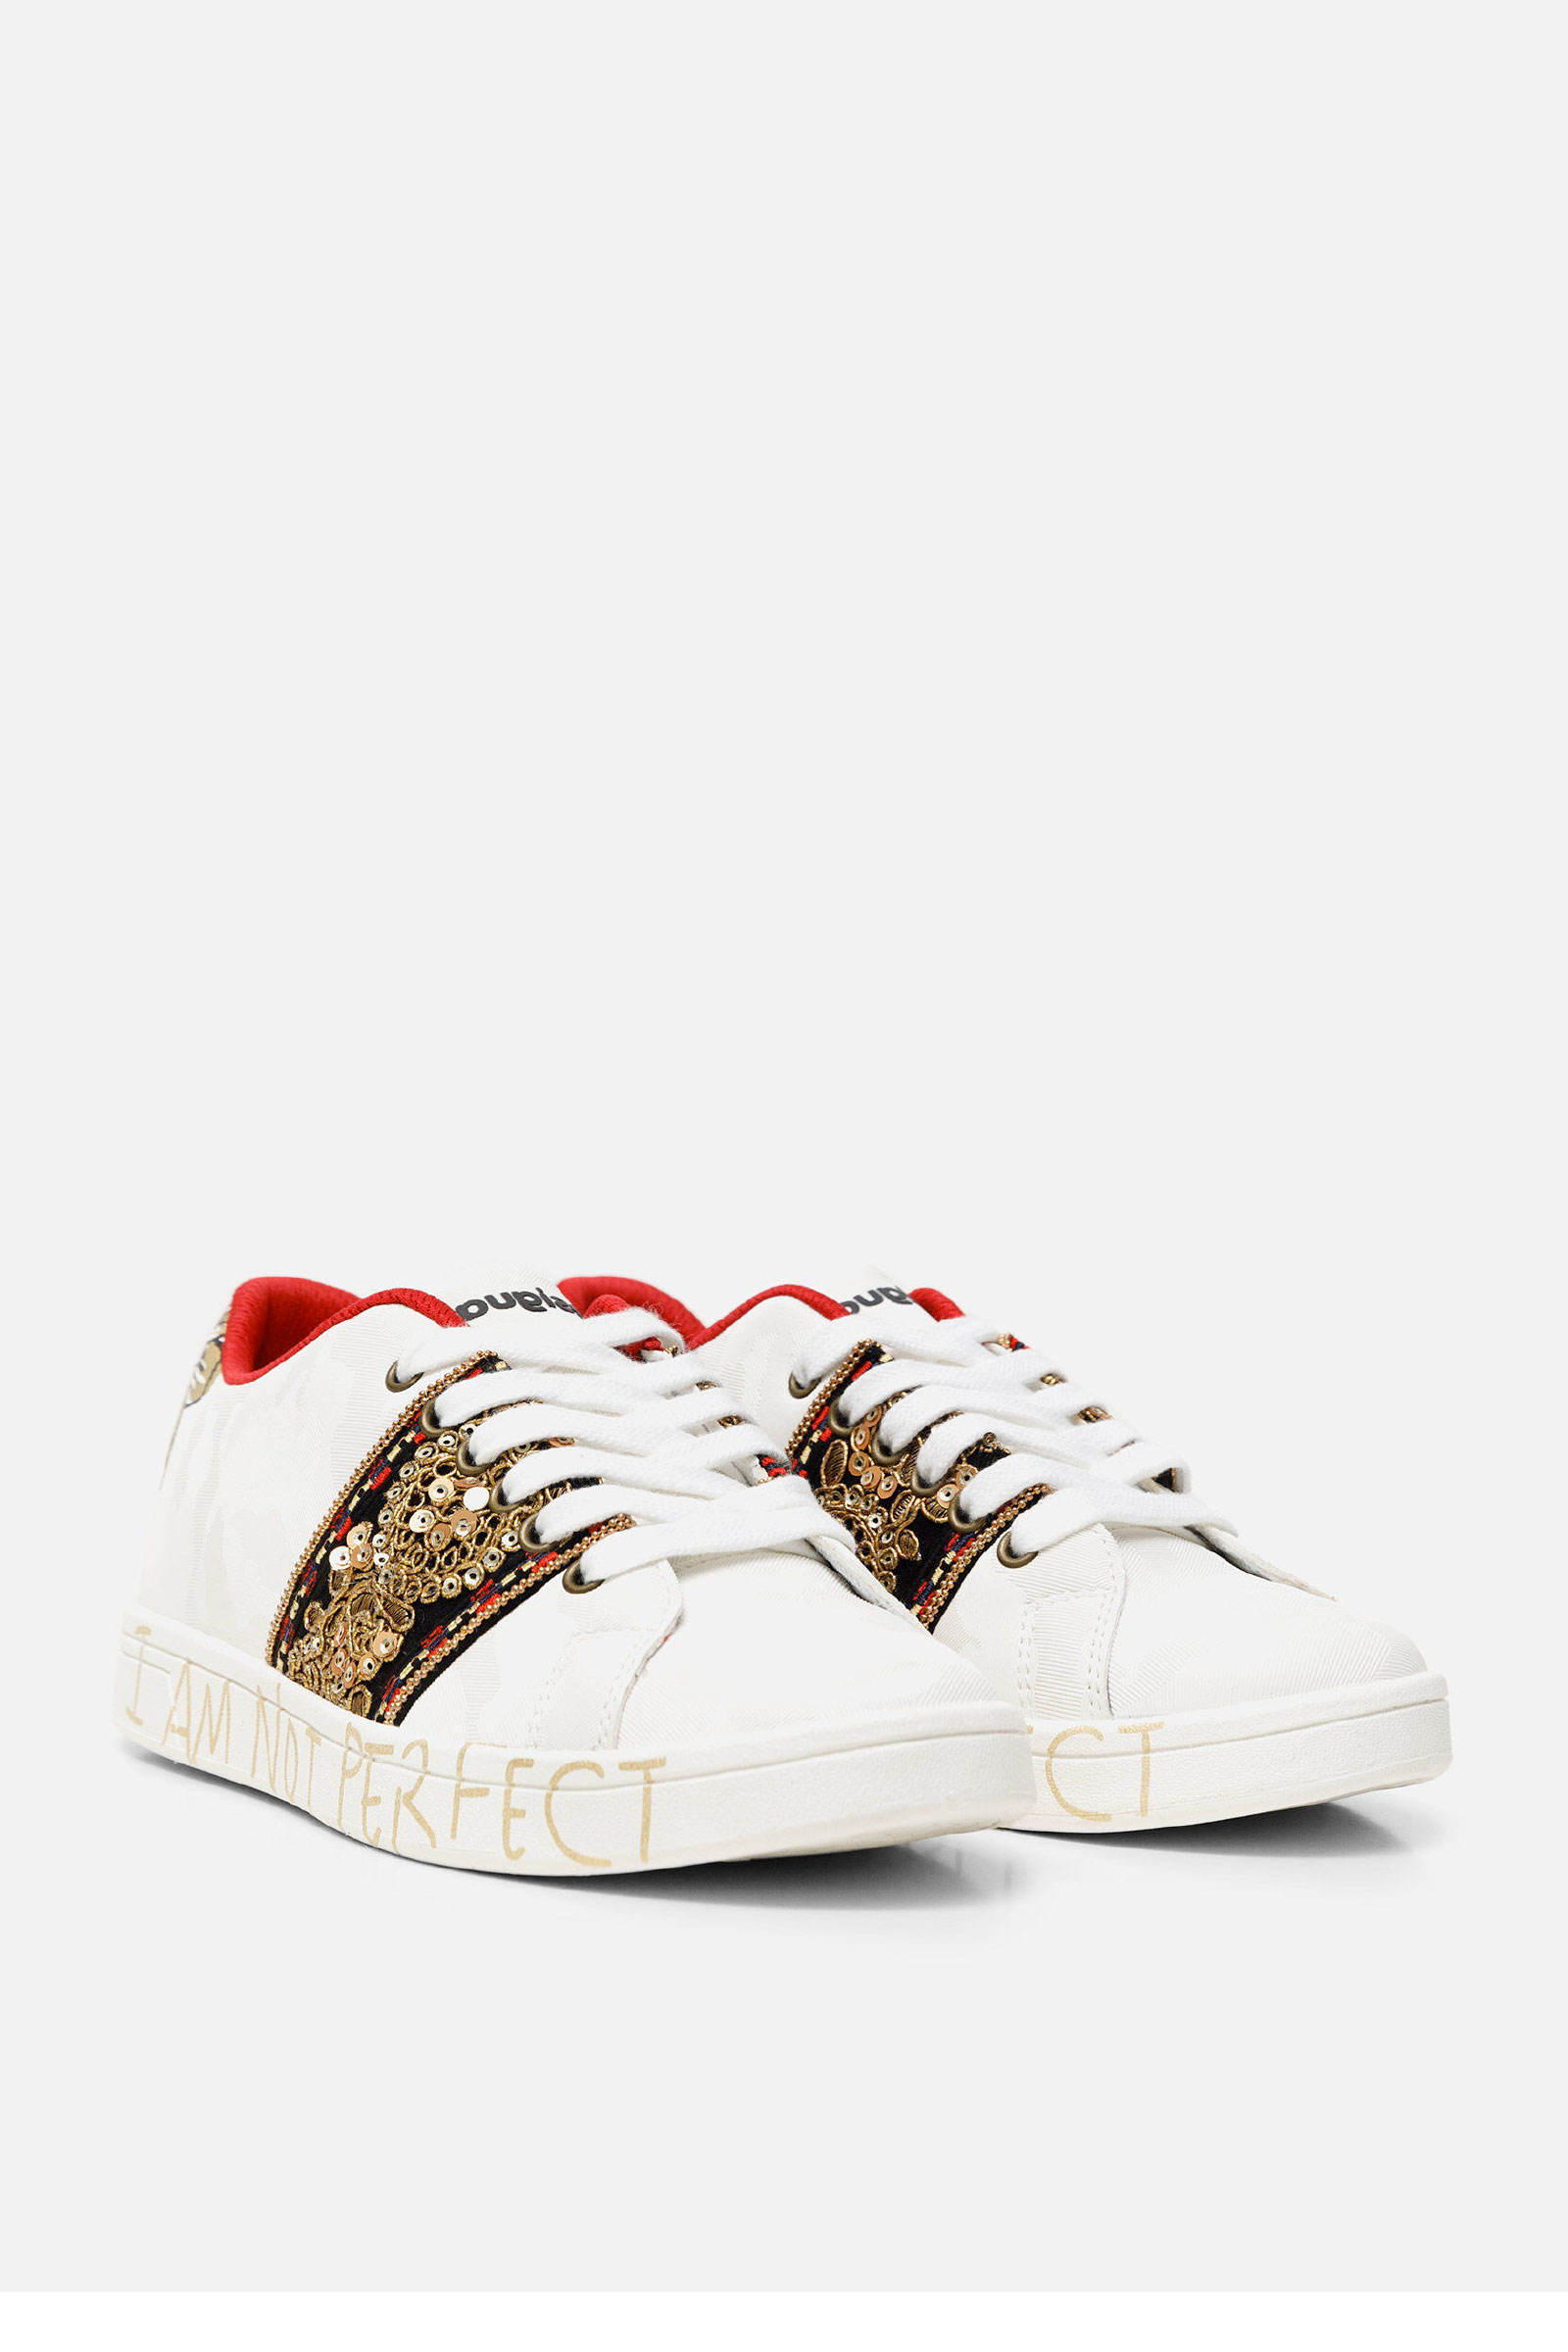 DESIGUAL women's shoes COSMIC INDIA model DESIGUAL | Shoes | 20WSKP031000